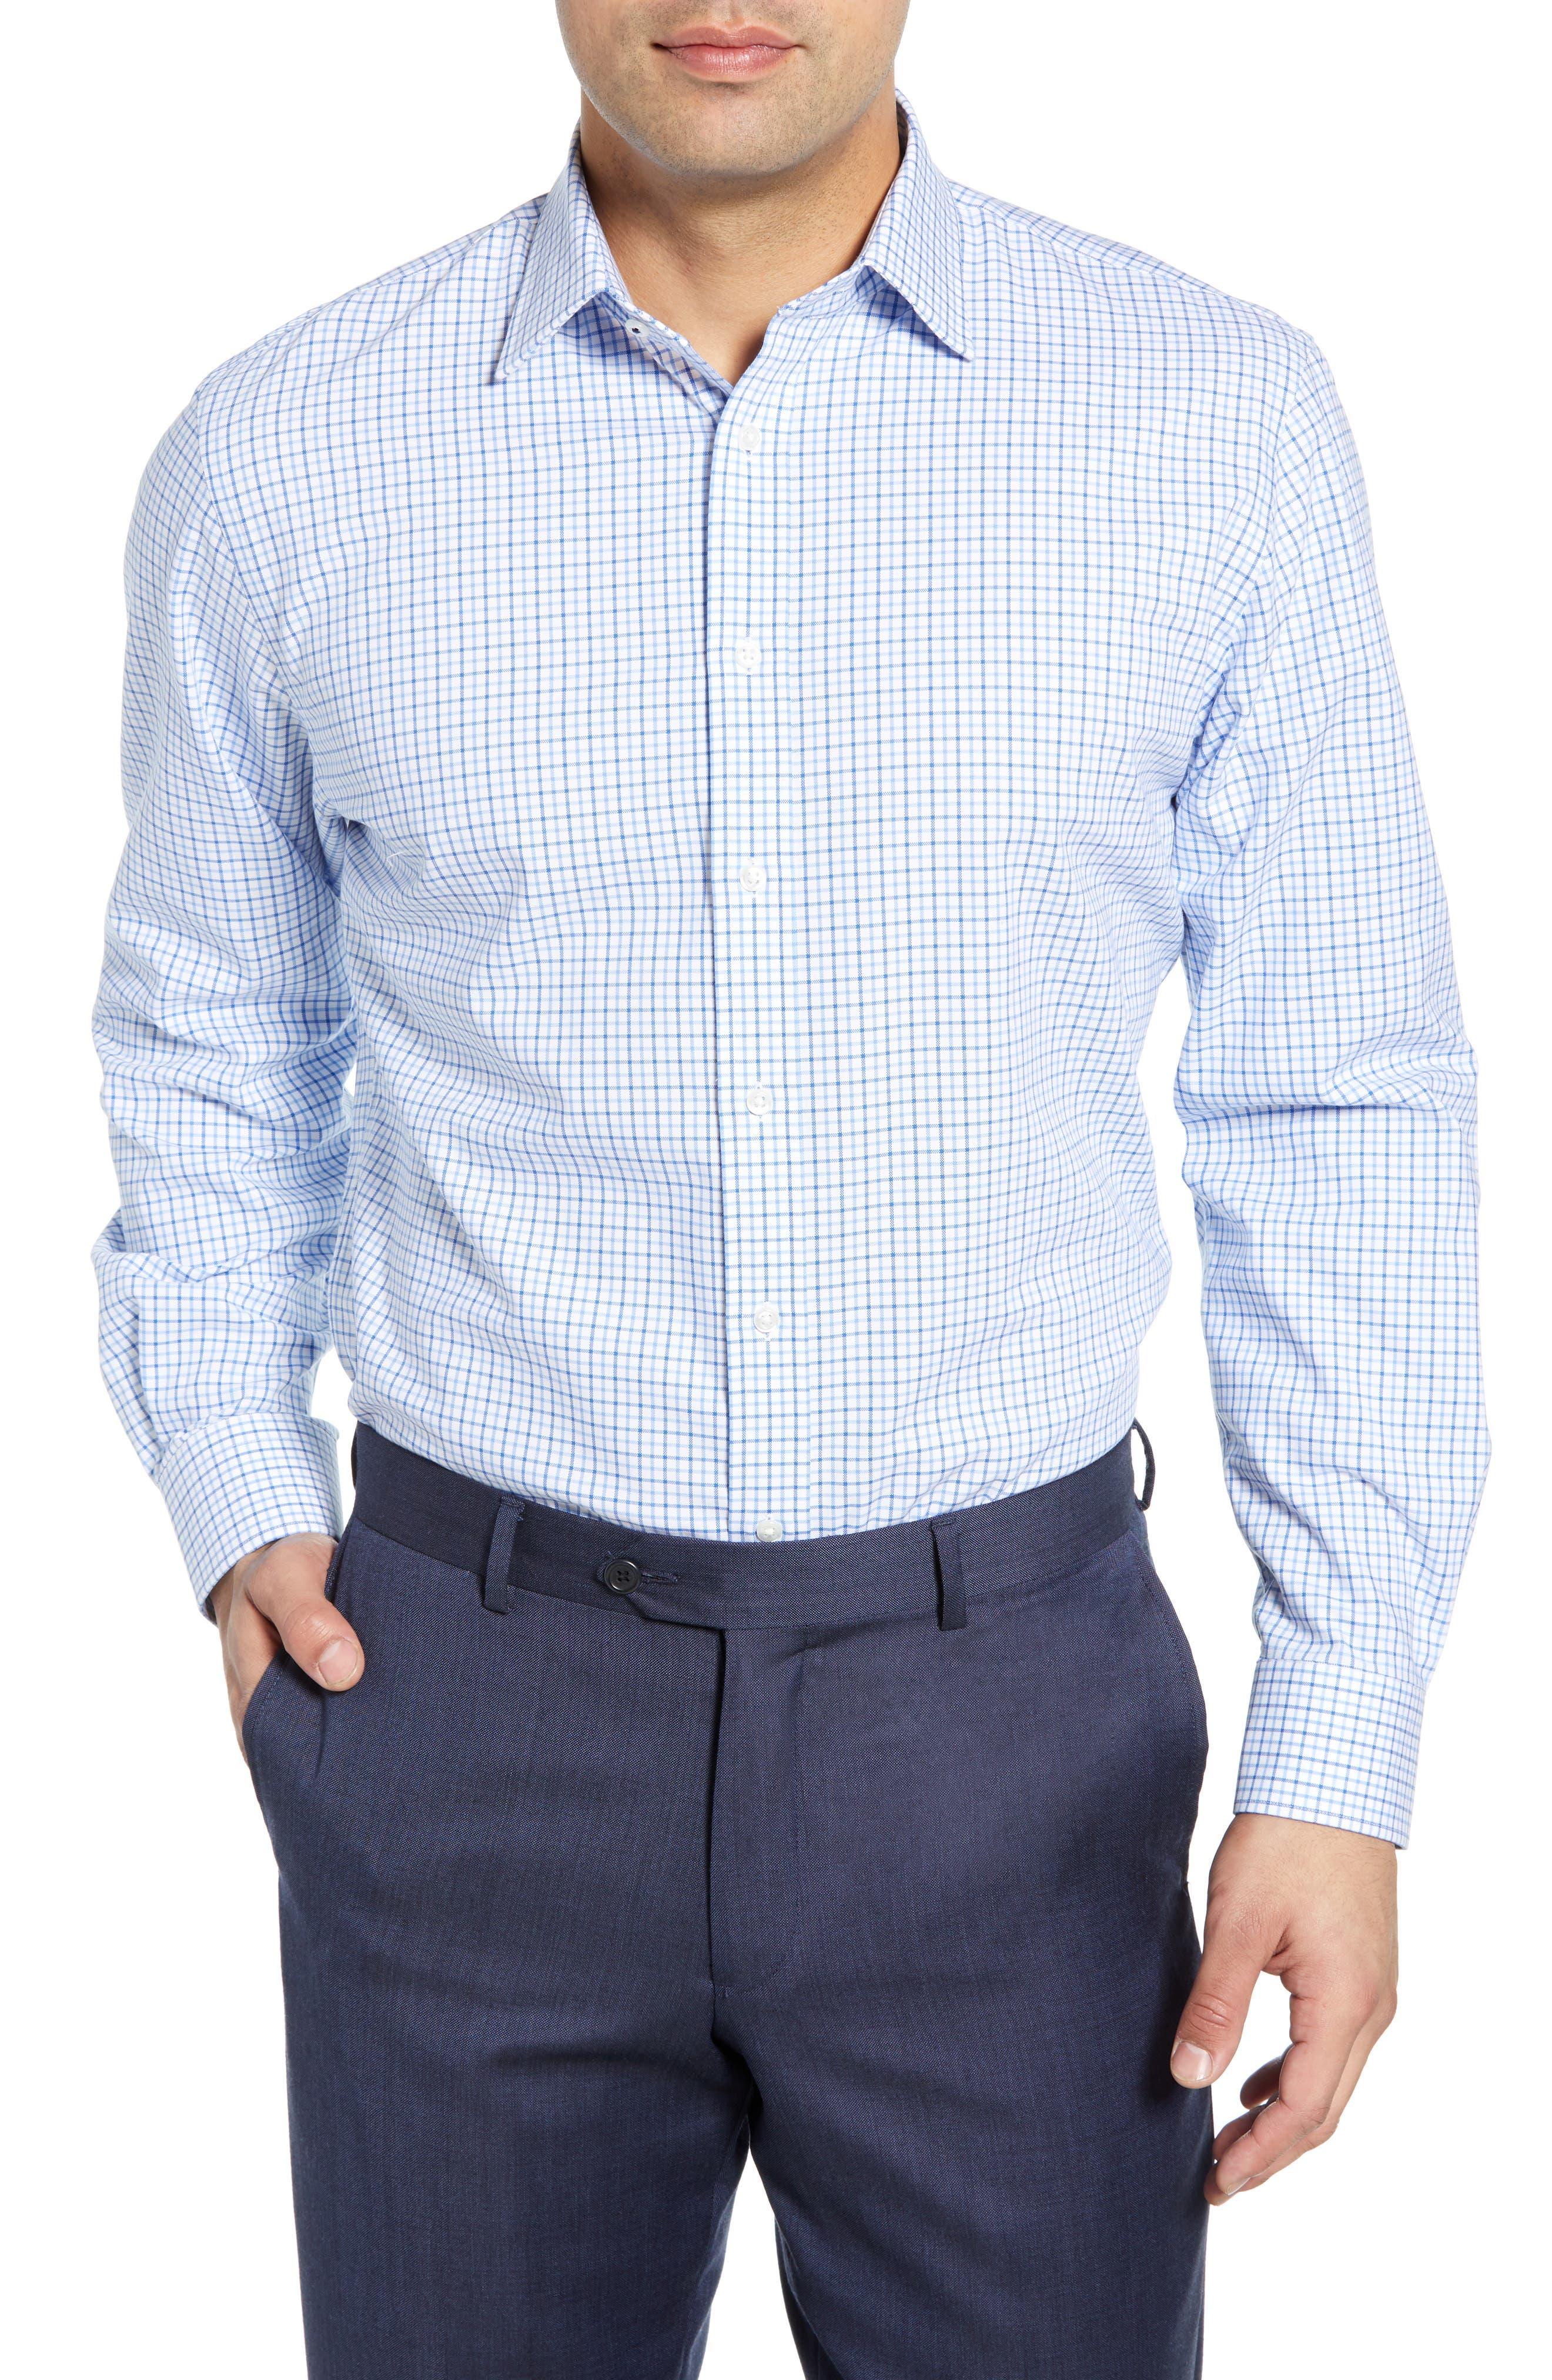 NORDSTROM MEN'S SHOP Tech-Smart Traditional Fit Check Stretch Dress Shirt, Main, color, BLUE VICTORIA